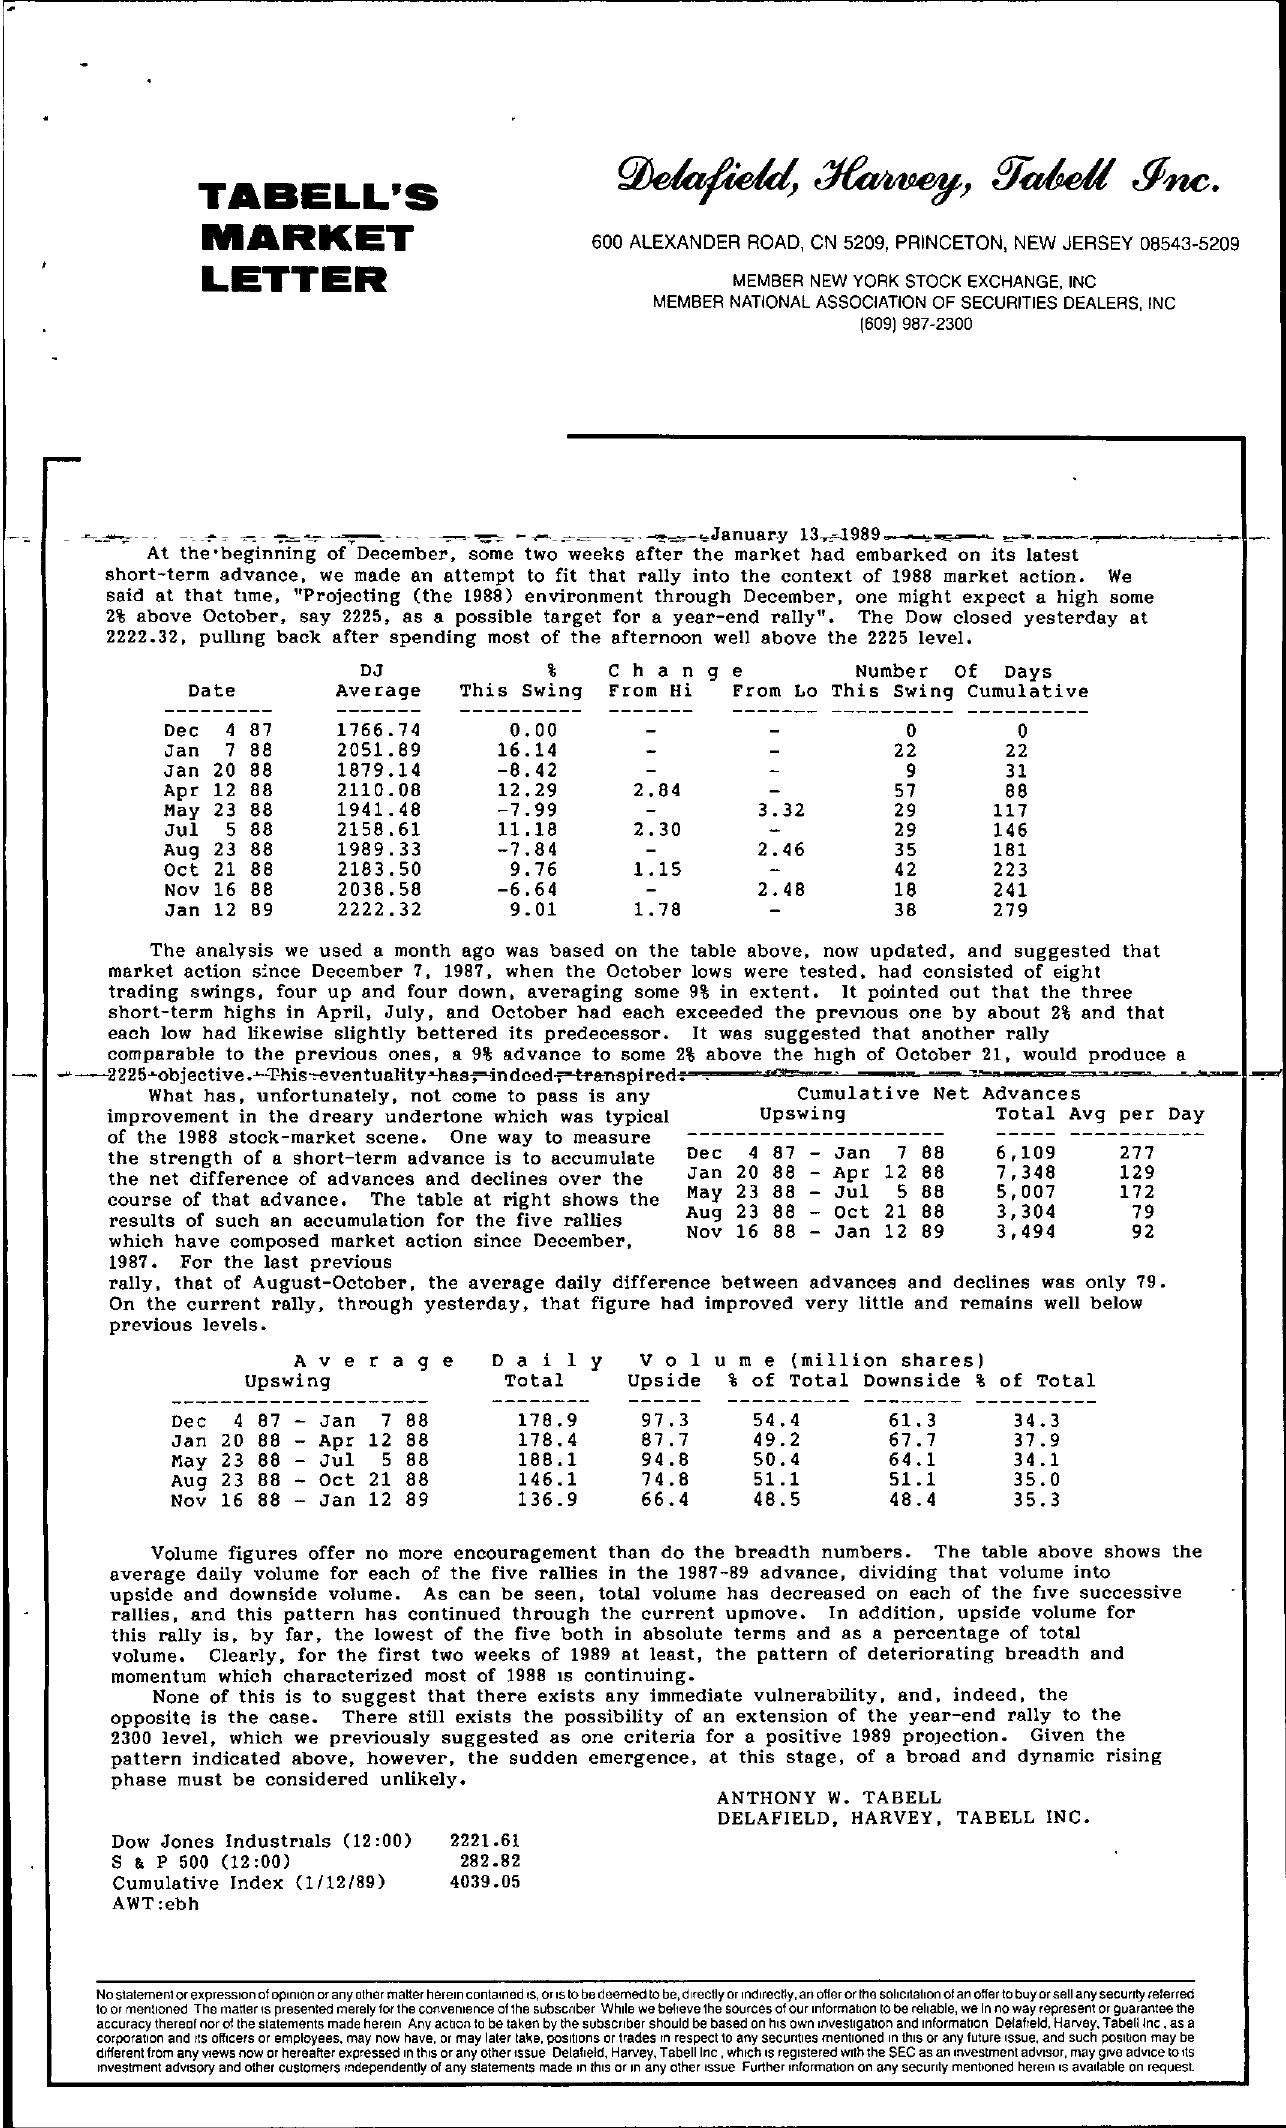 Tabell's Market Letter - January 13, 1989